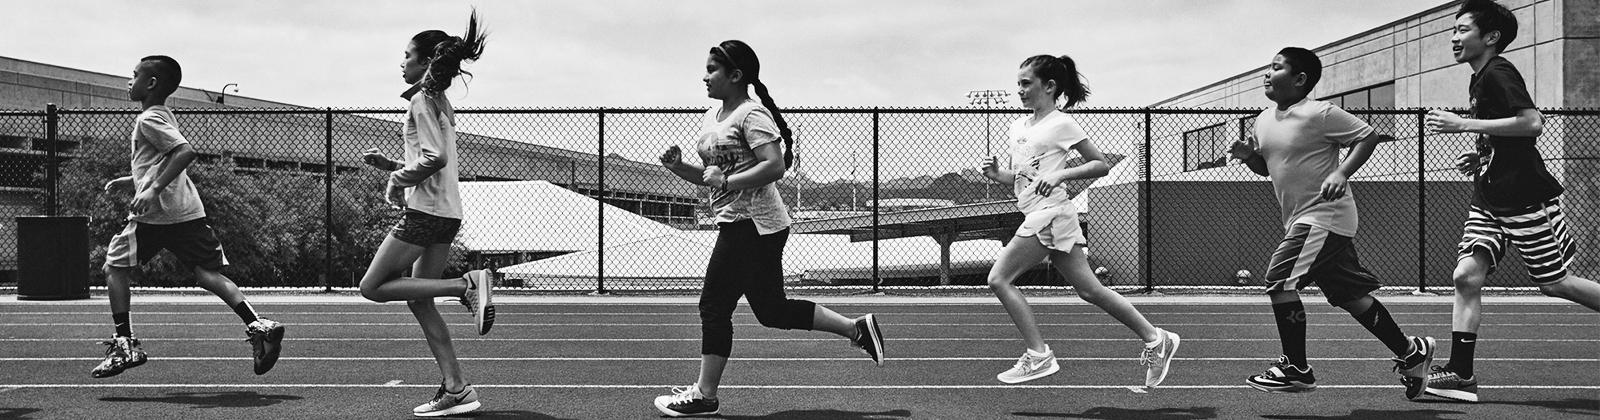 elegir despacho calidad estable estilo novedoso Marathon Kids Miler   Nike